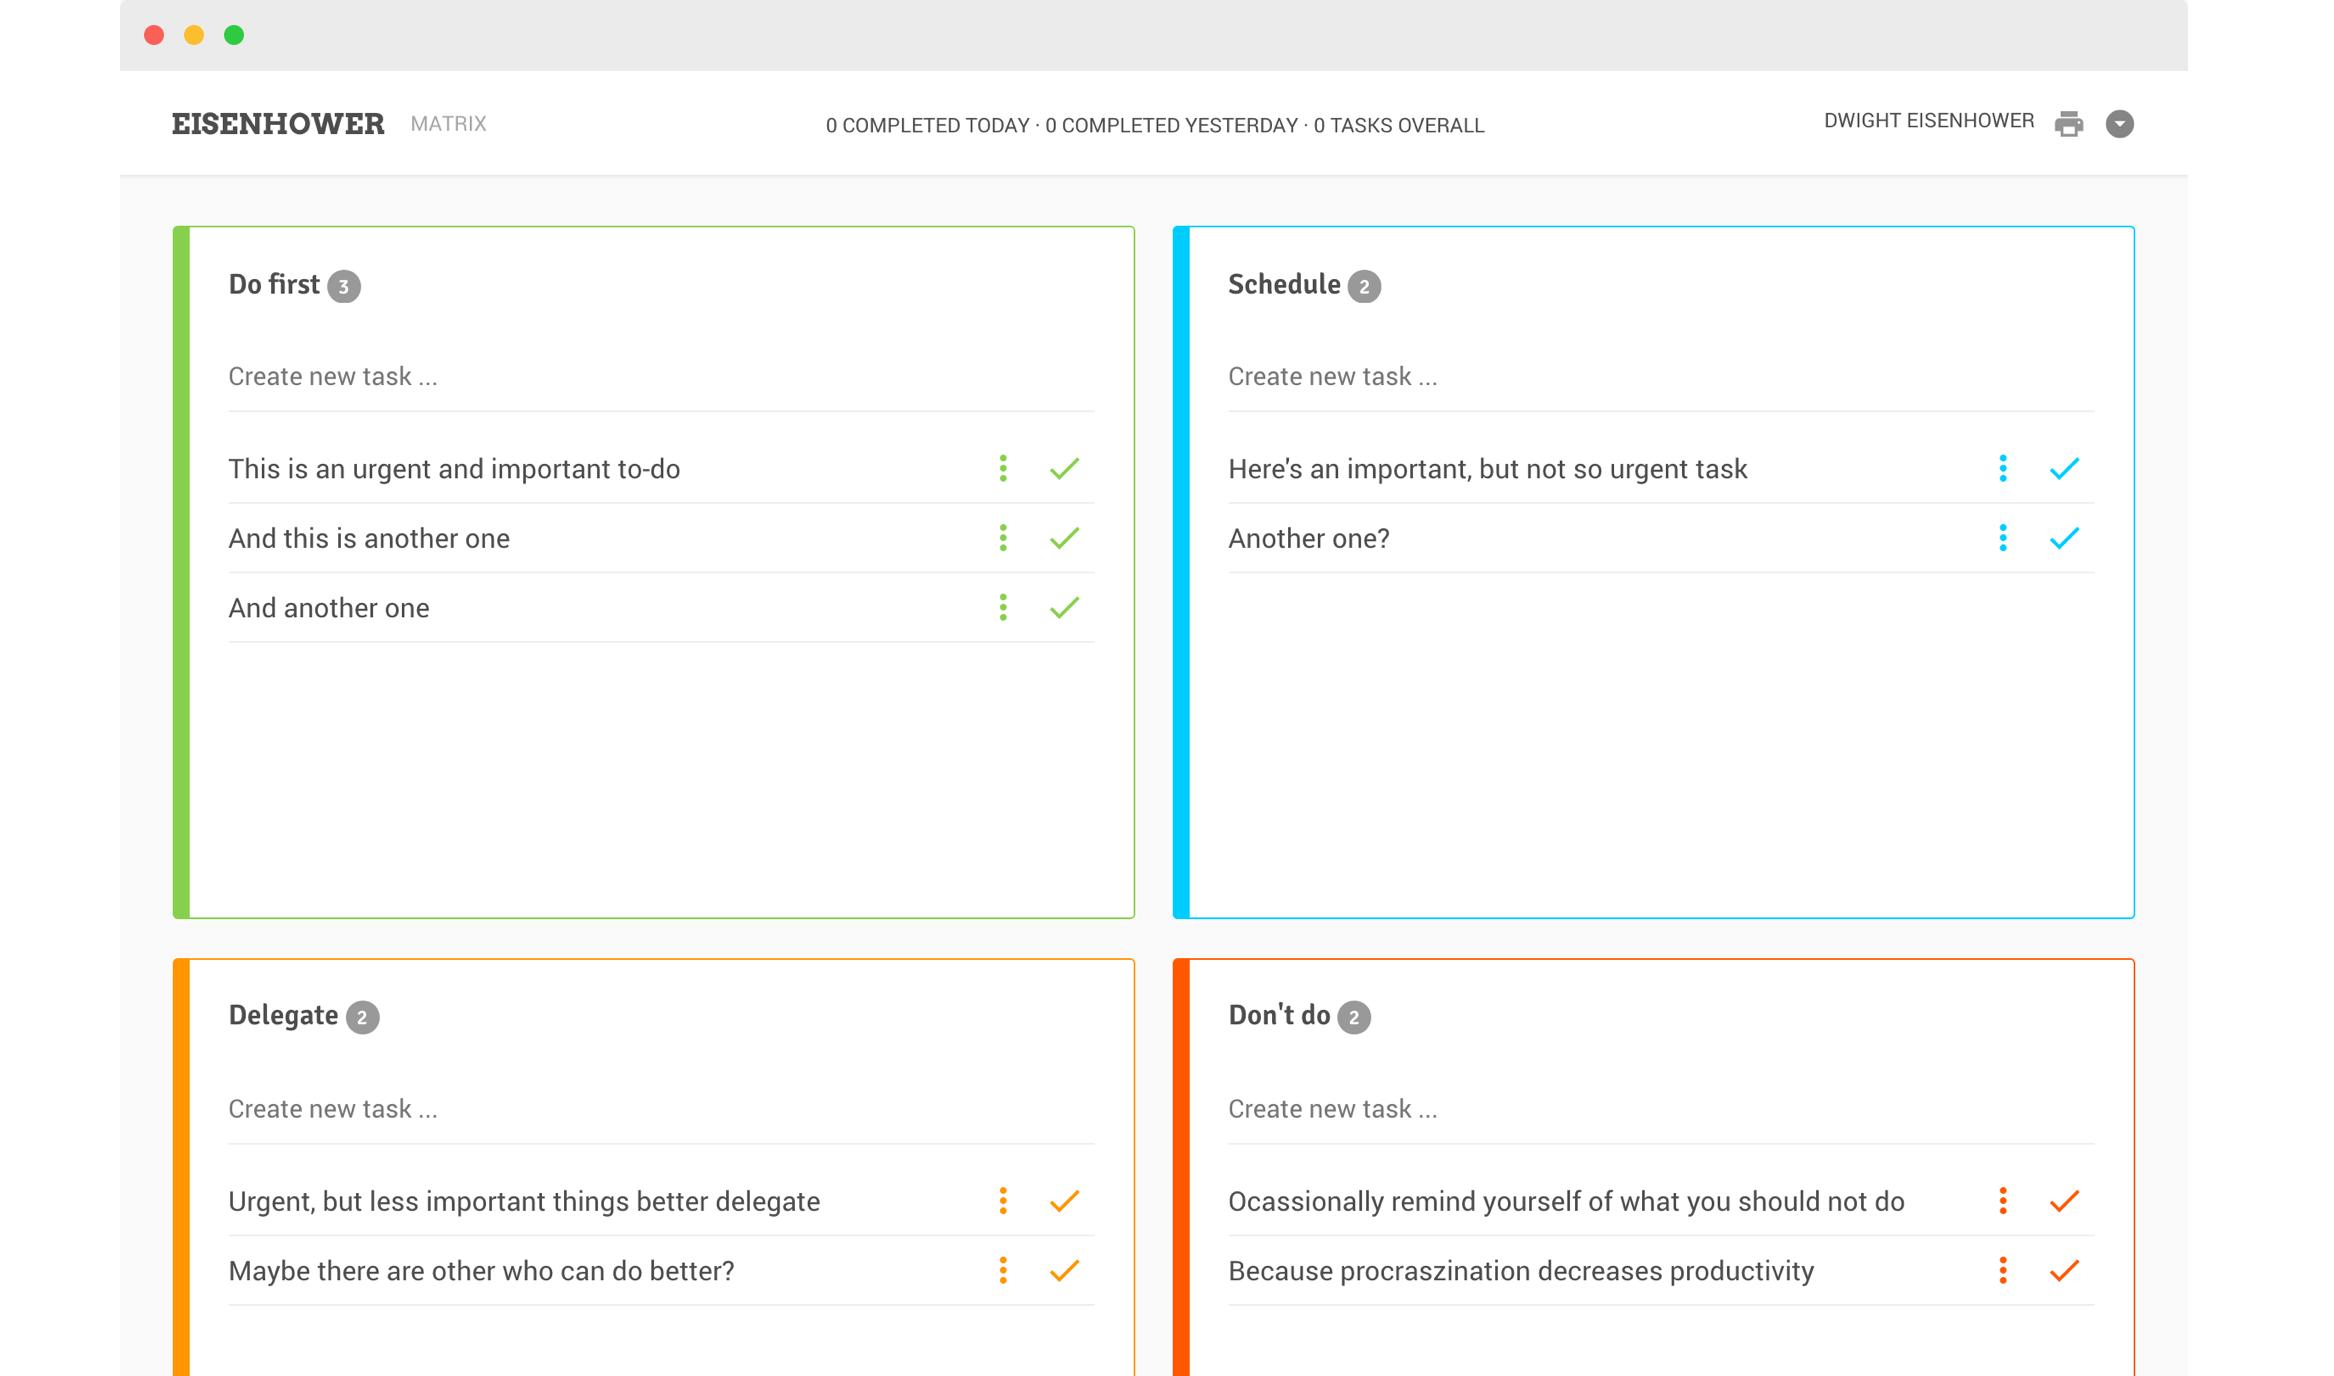 eisenhower app main interface